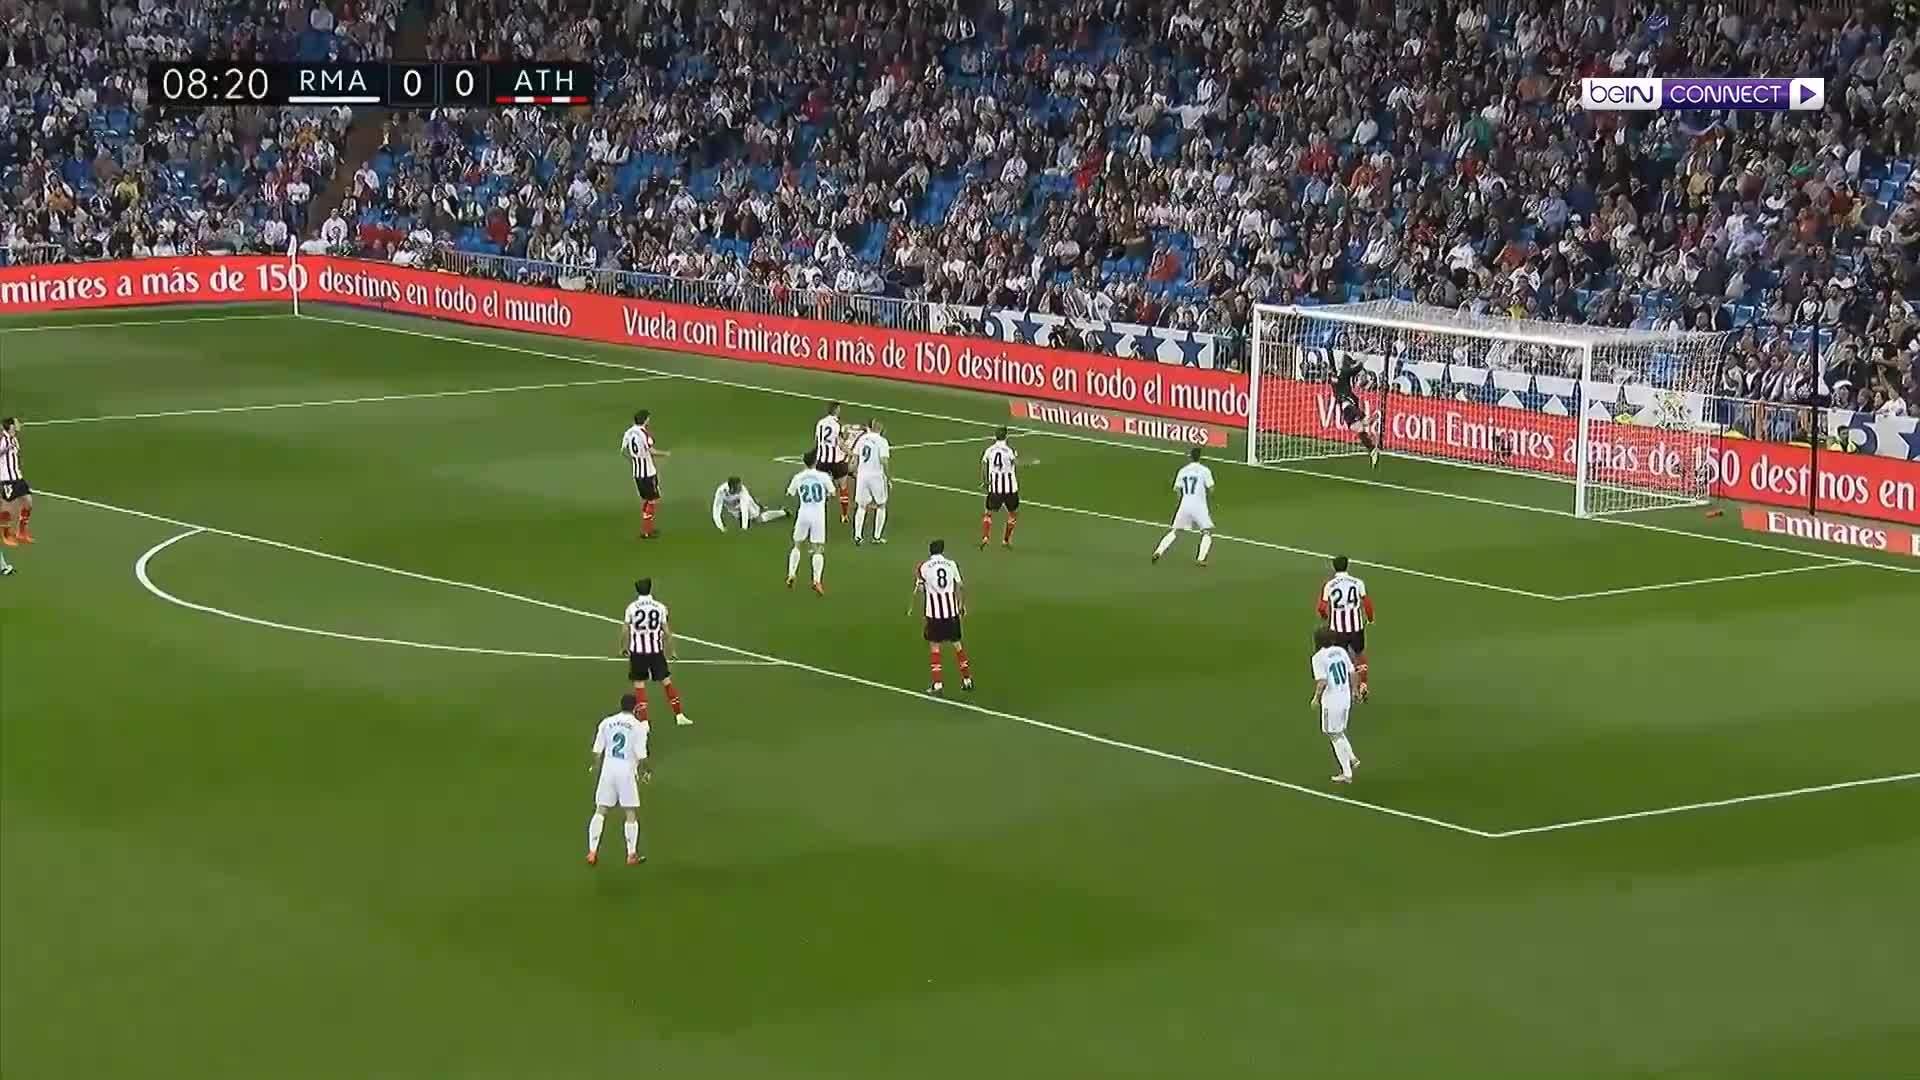 Real Madrid 1-1 Athletic Bilbao